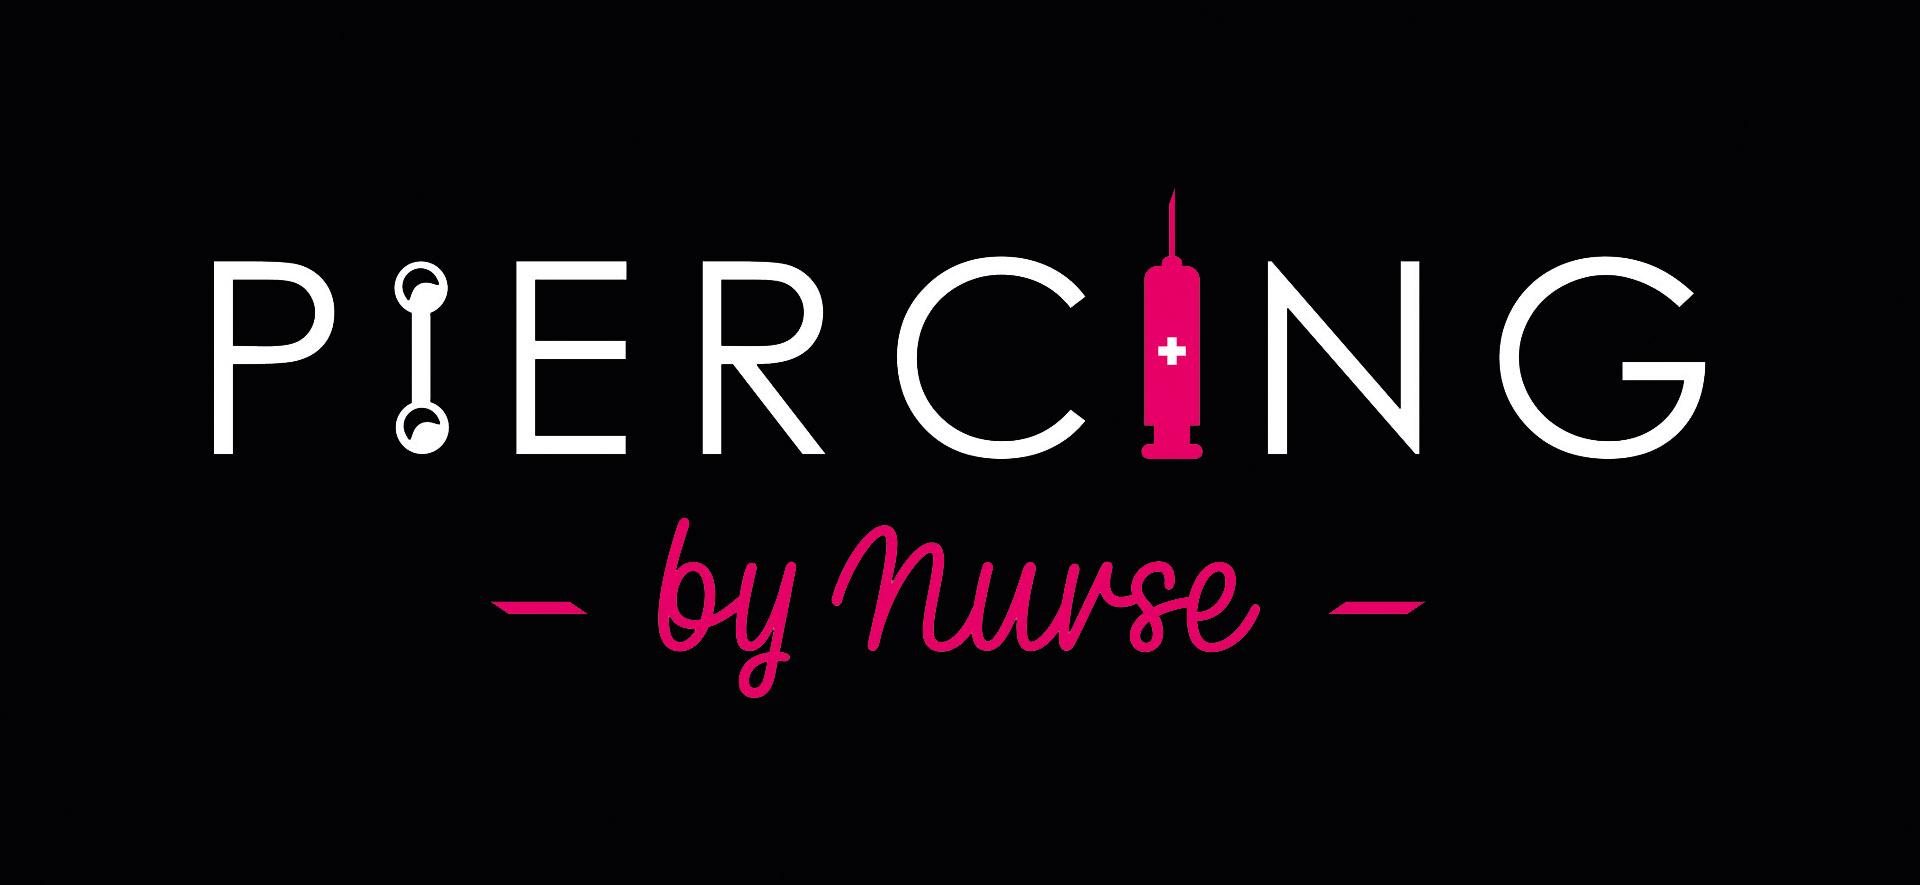 logo-piercing-by-nurse-blacl